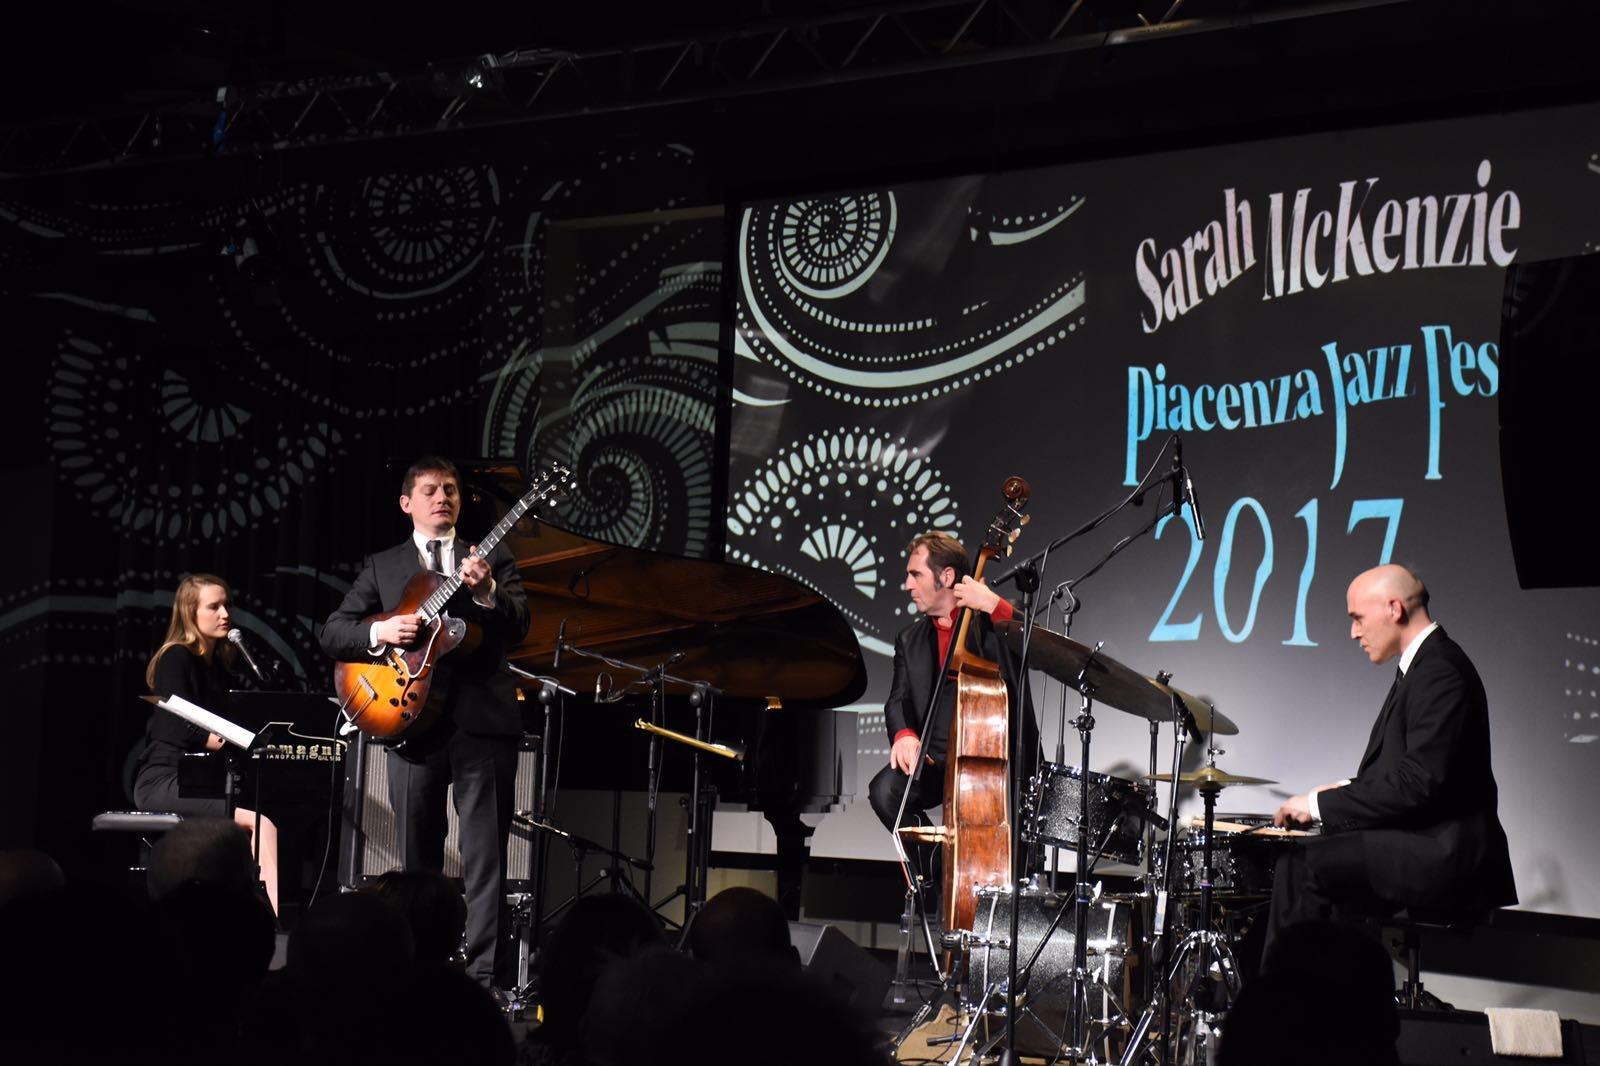 Piacenza Jazz Fest, partenza col botto:  Sarah McKenzie strega lo Spazio Rotative